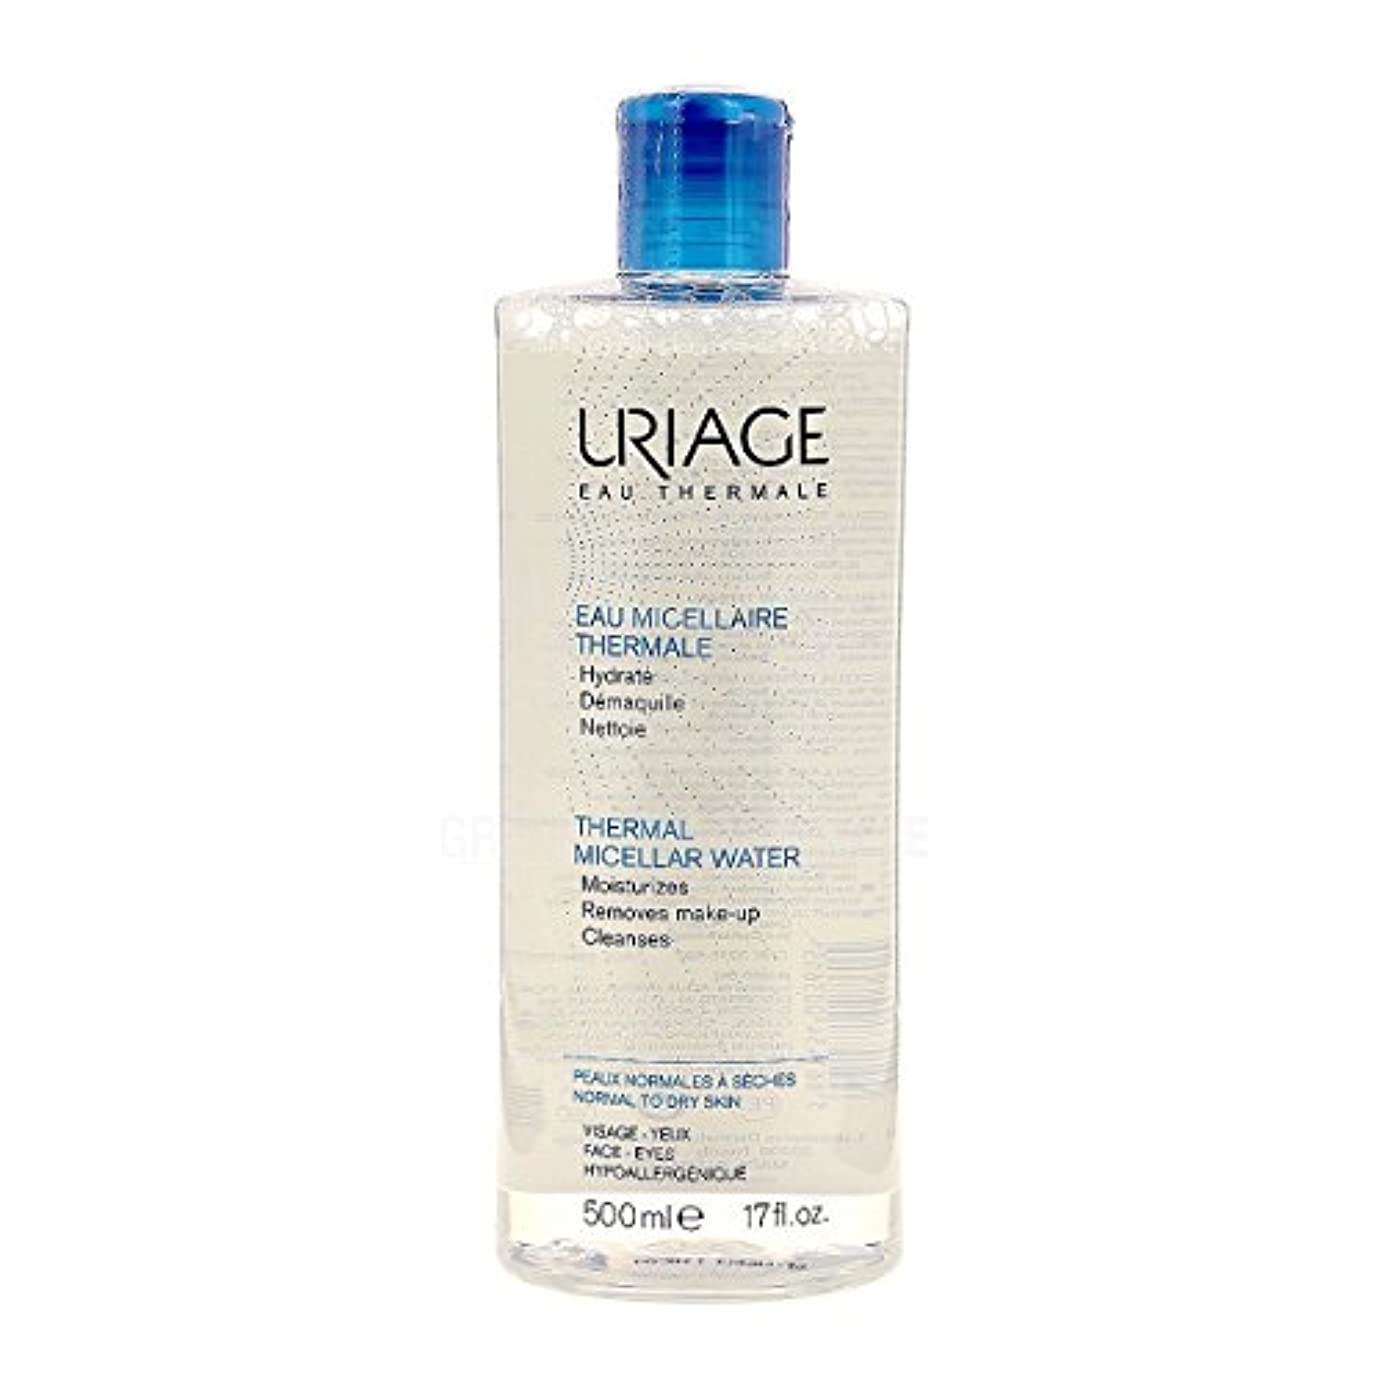 Uriage Thermal Micellar Water Normal To Dry Skin 500ml [並行輸入品]